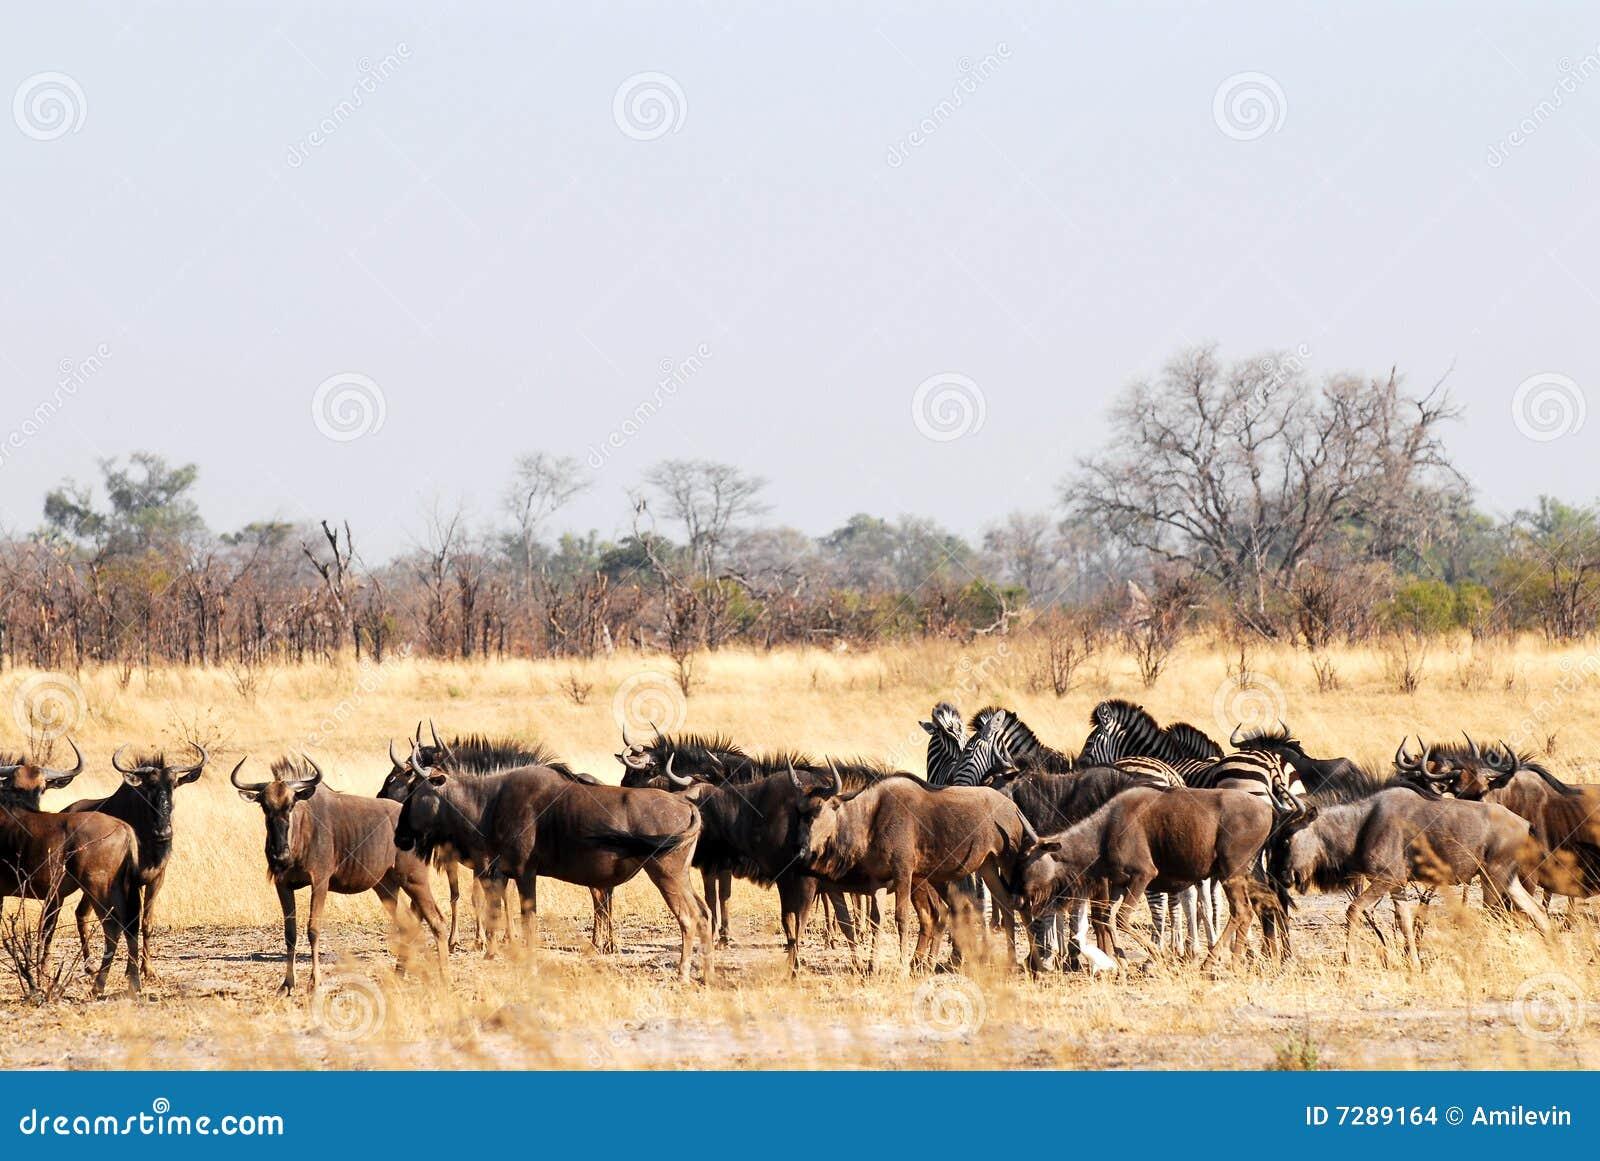 The Wildebeests - Rudolph's Ruin